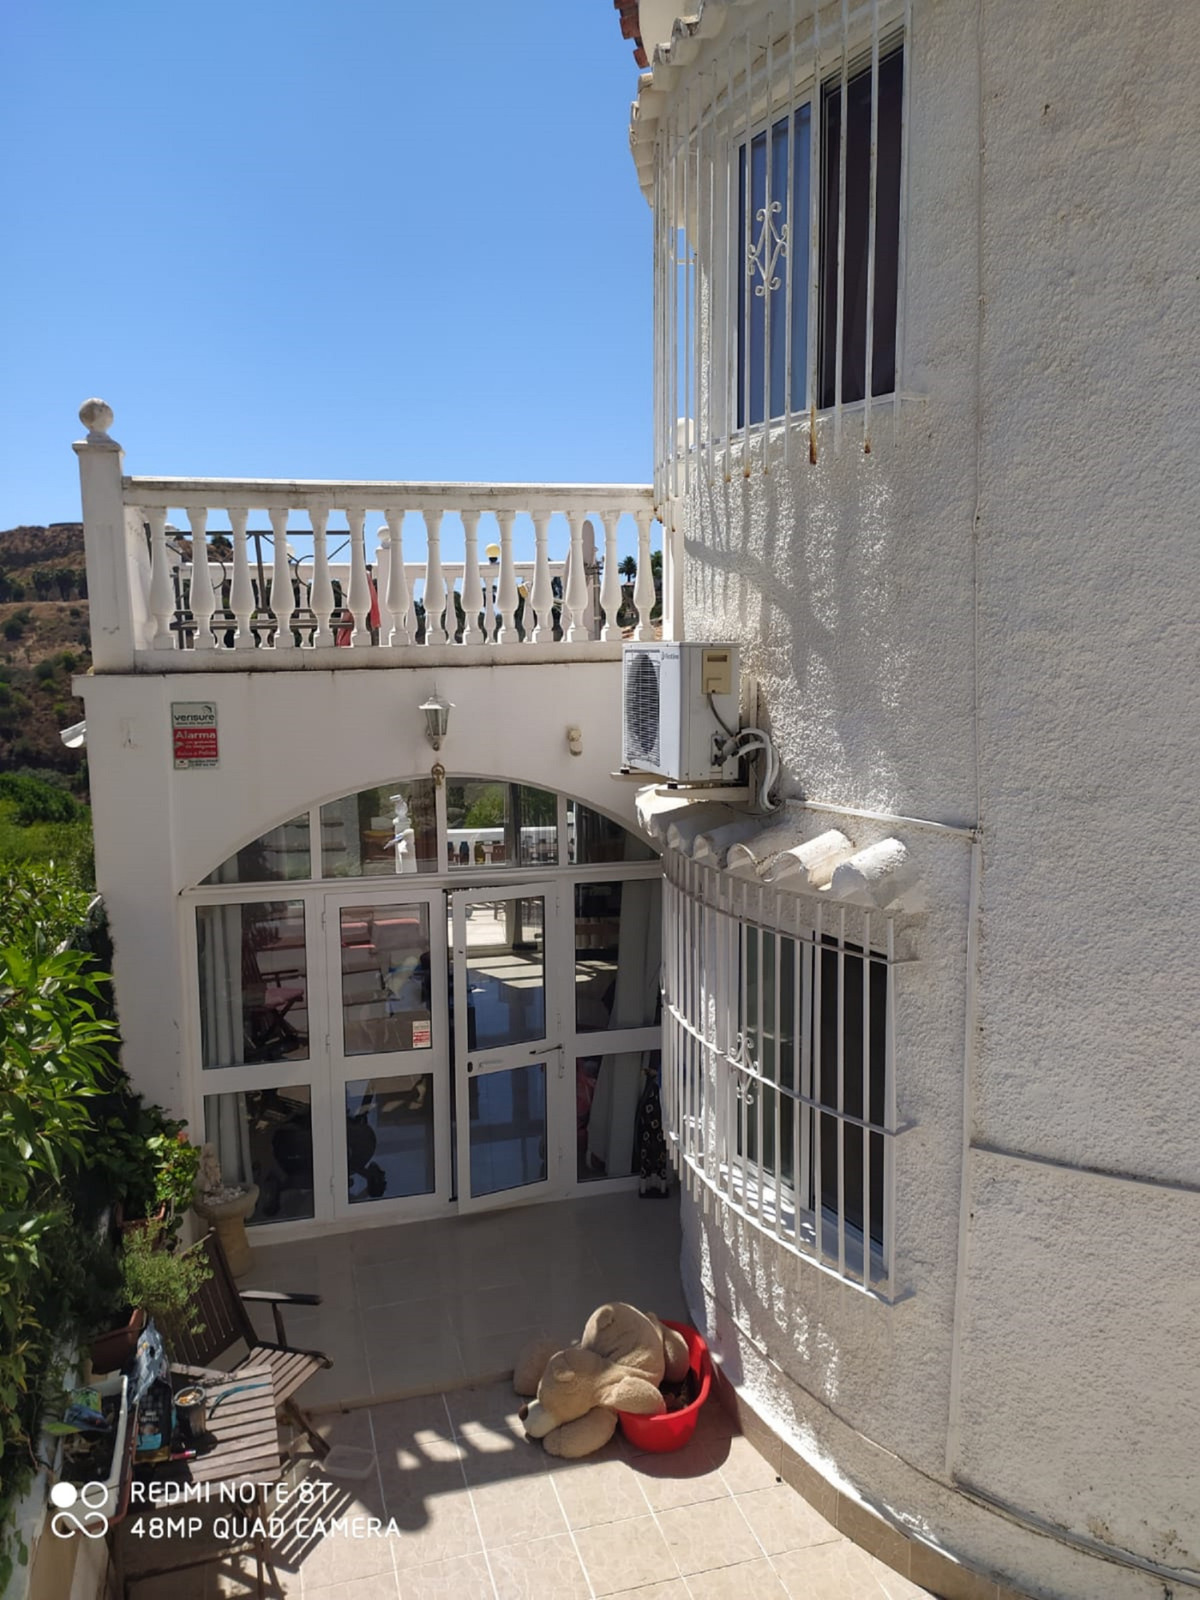 Sales - House - Benalmadena - 39 - mibgroup.es